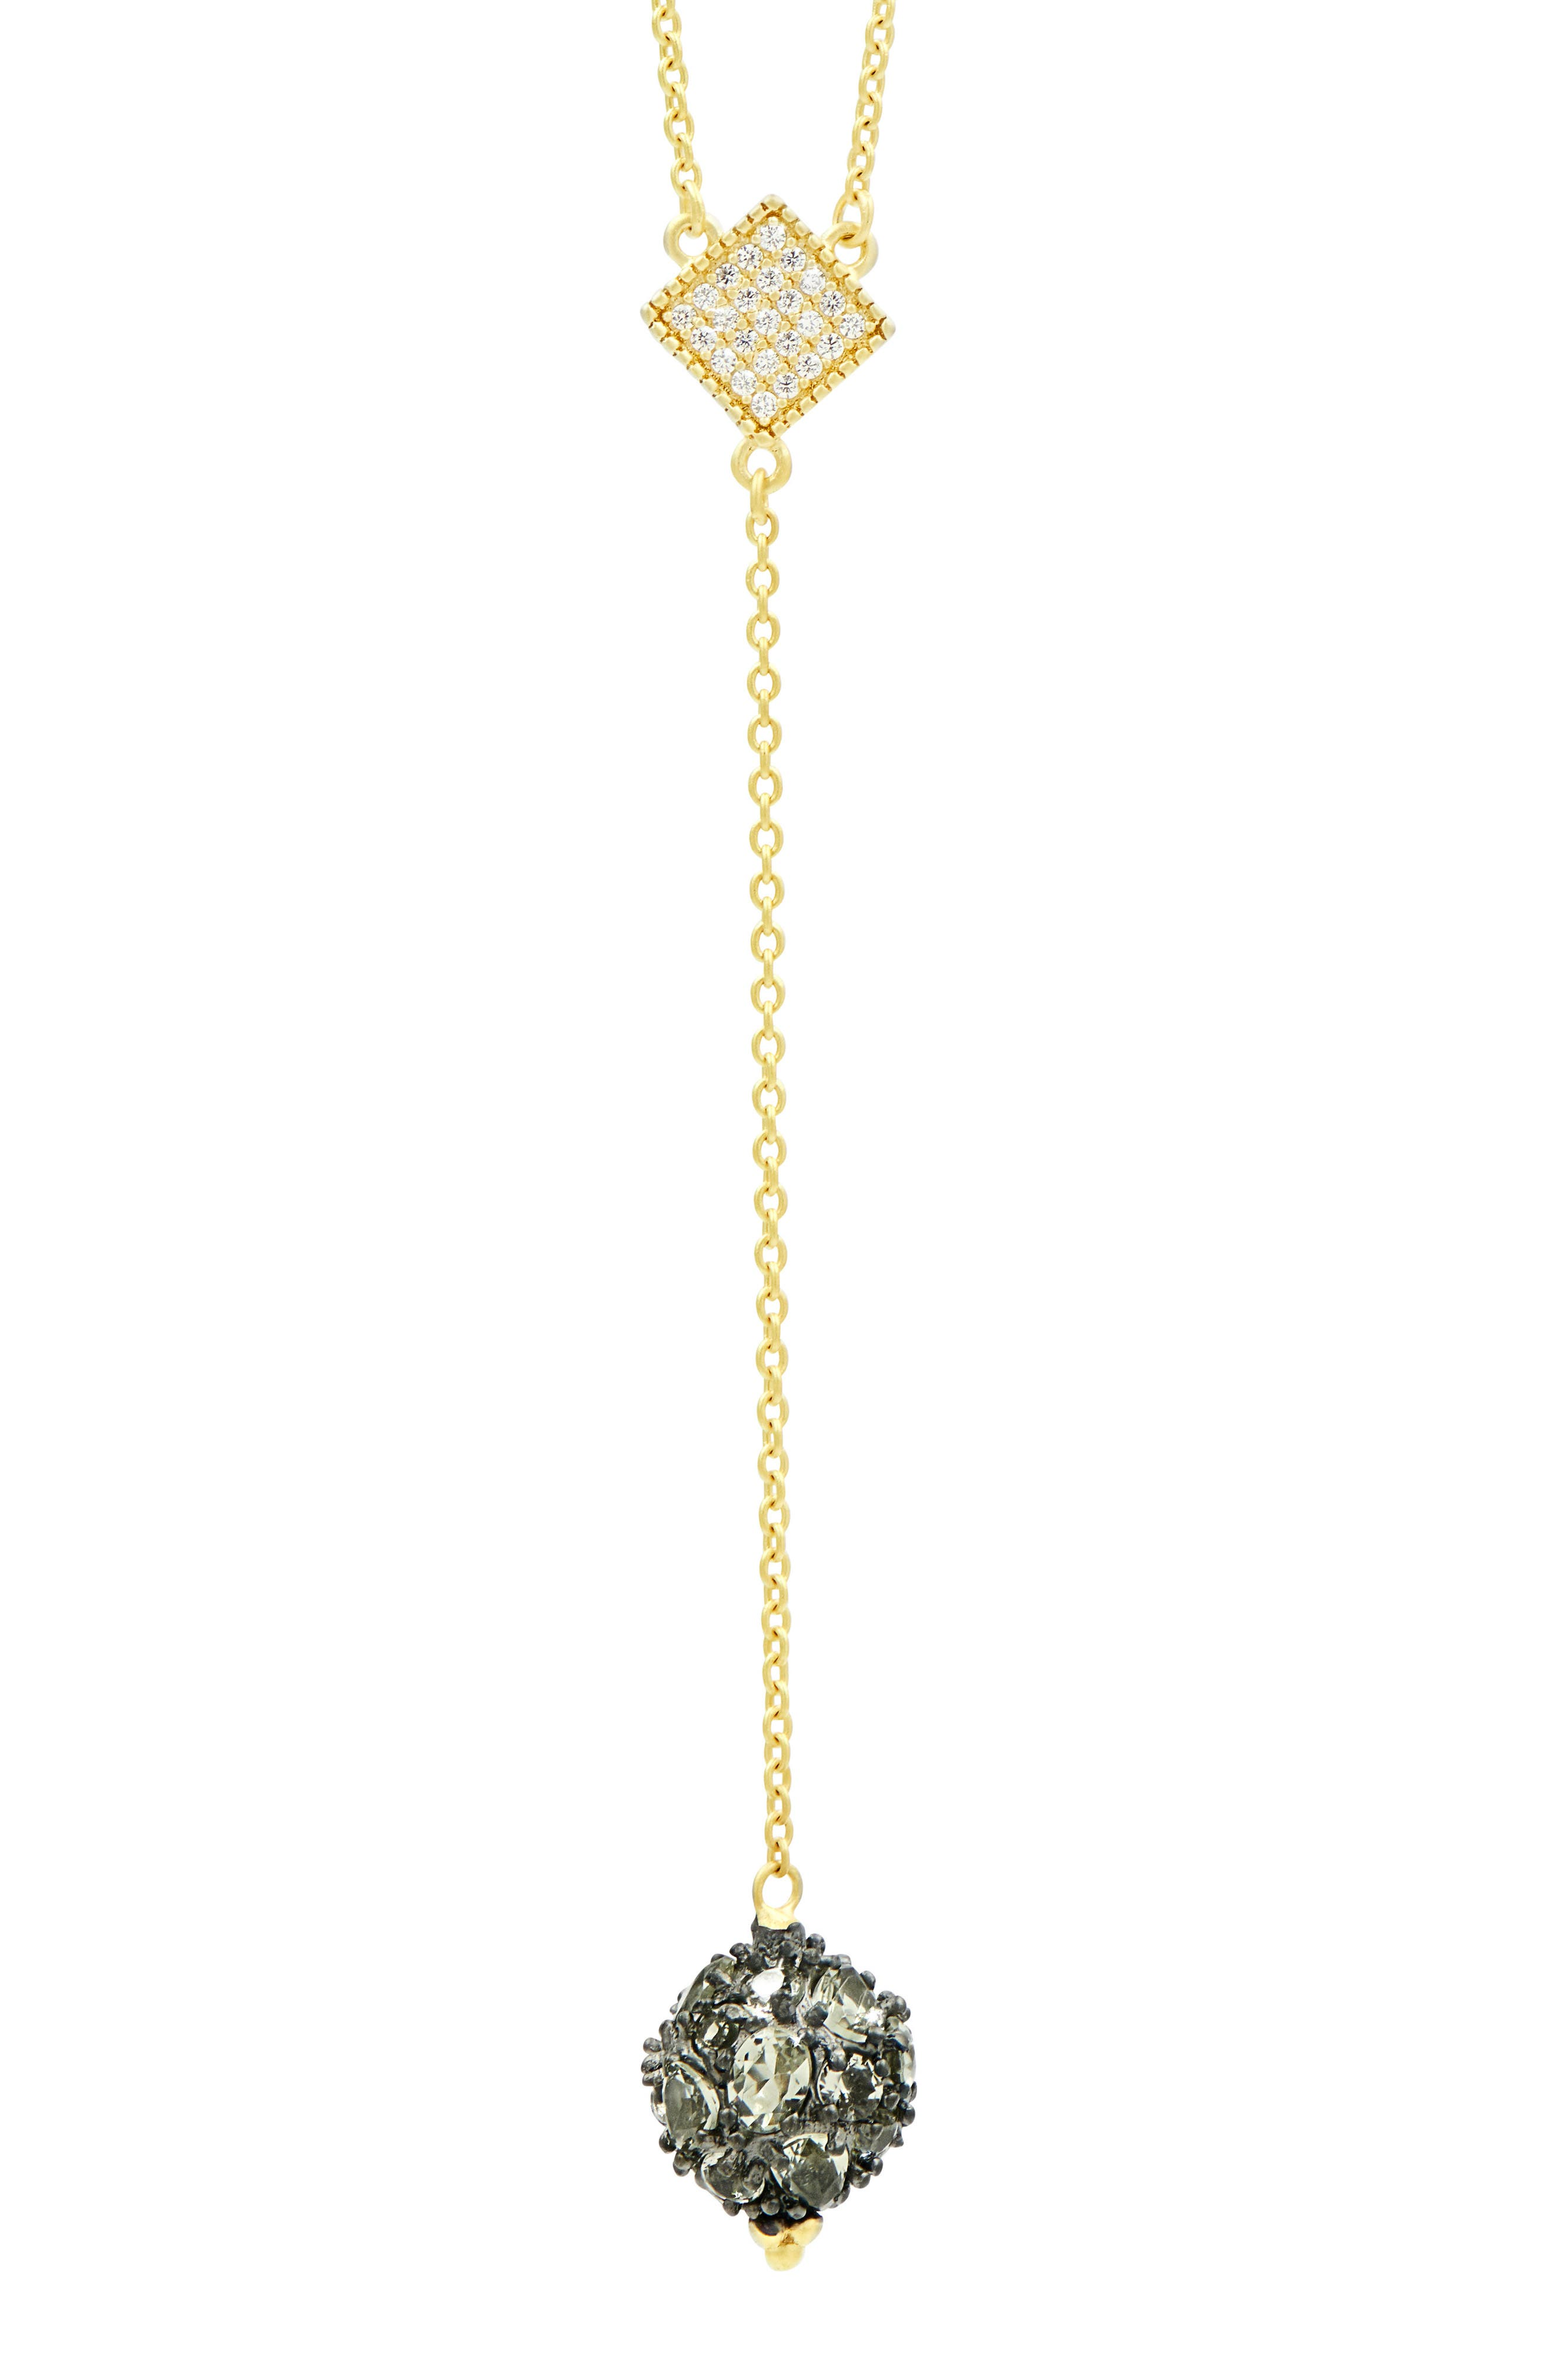 Rose Dor Y-Shape Necklace,                             Alternate thumbnail 2, color,                             710